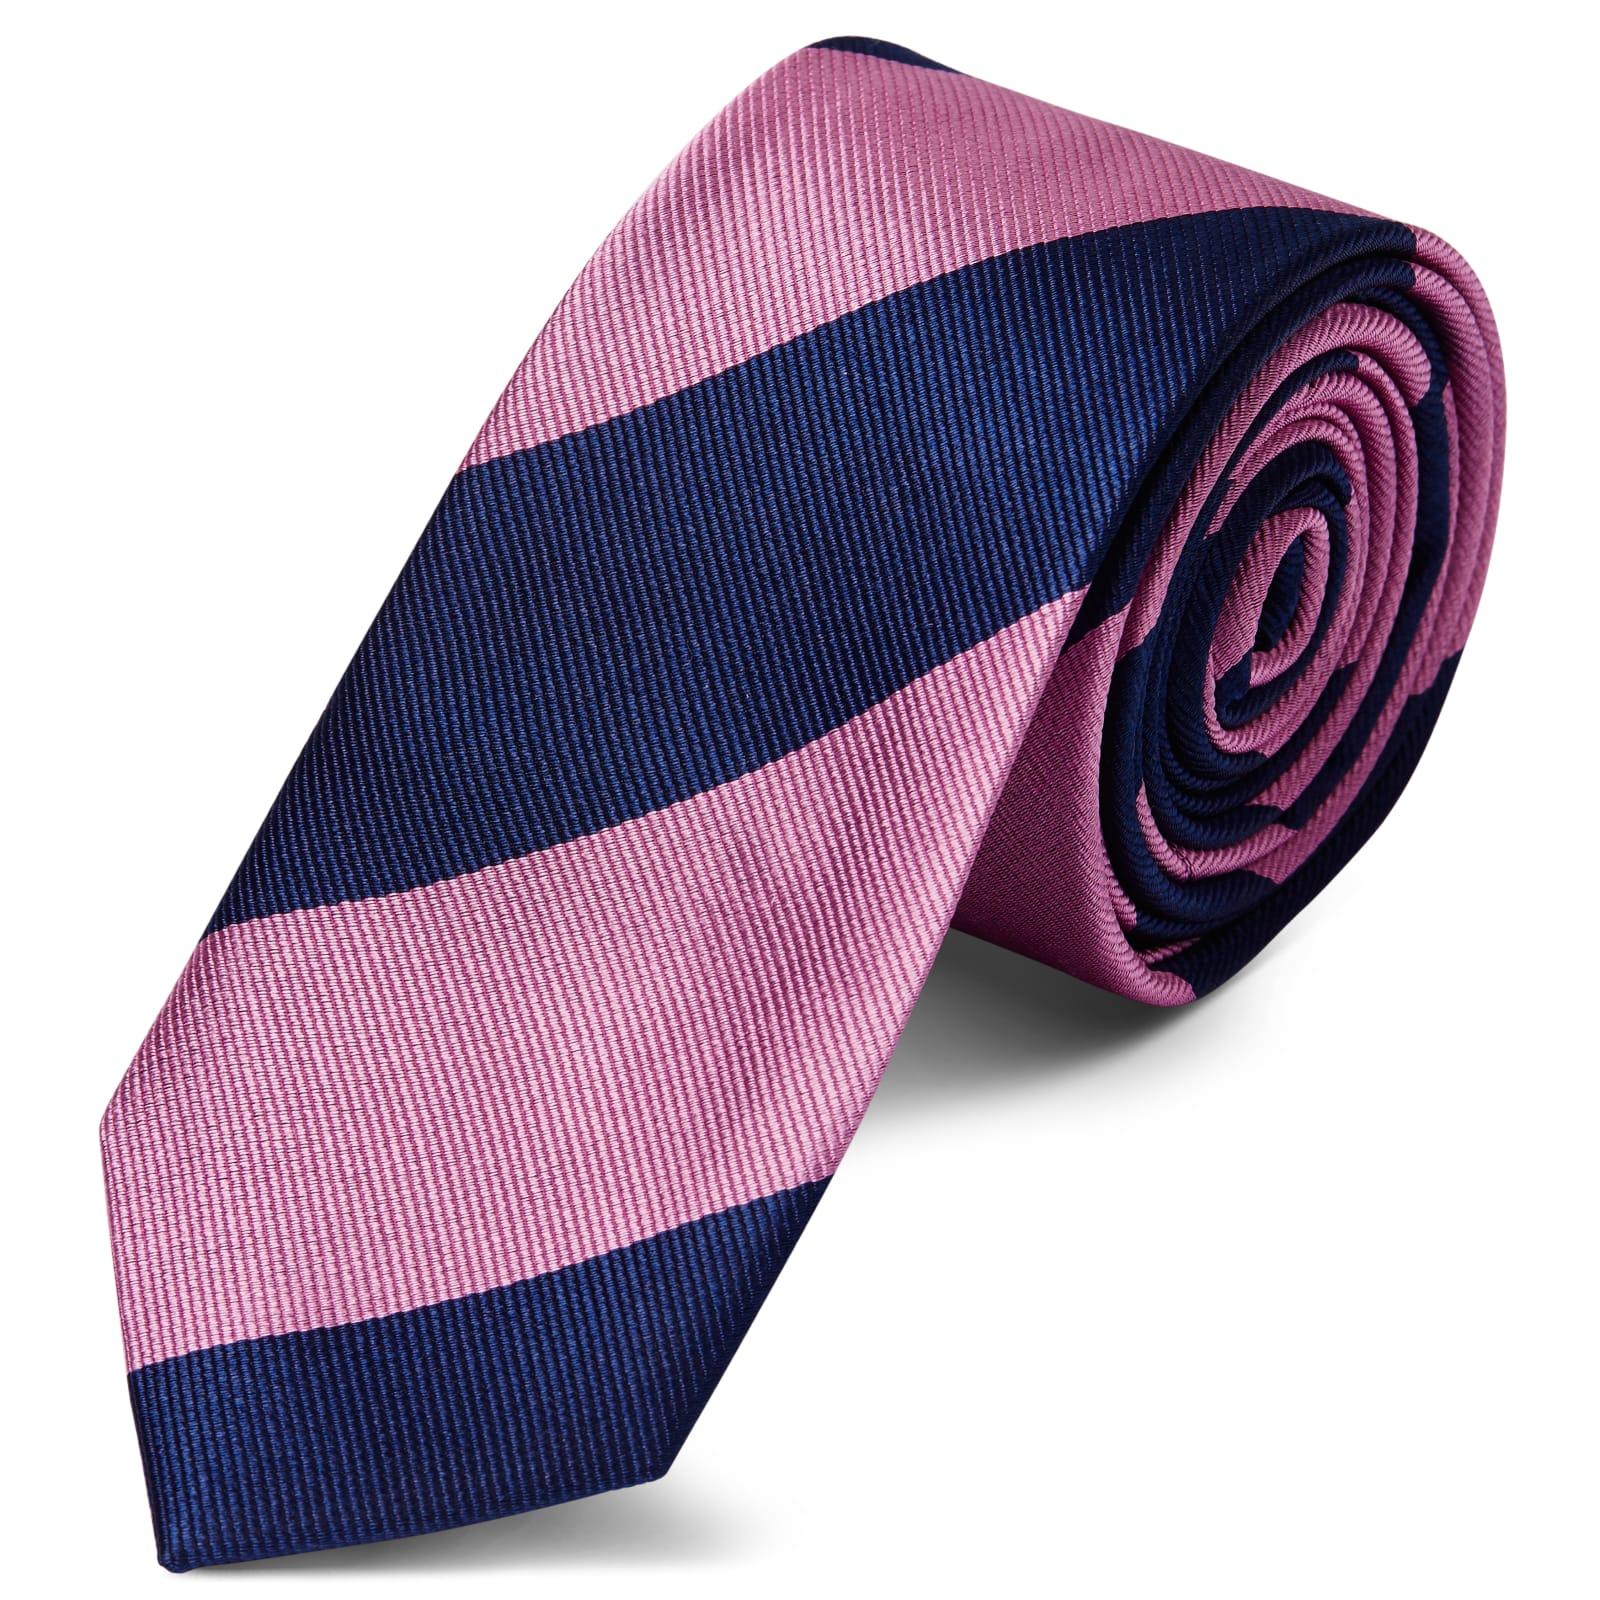 Rayures Marine Rose Et En Cravate Soie À Bleu nmy0vN8wO